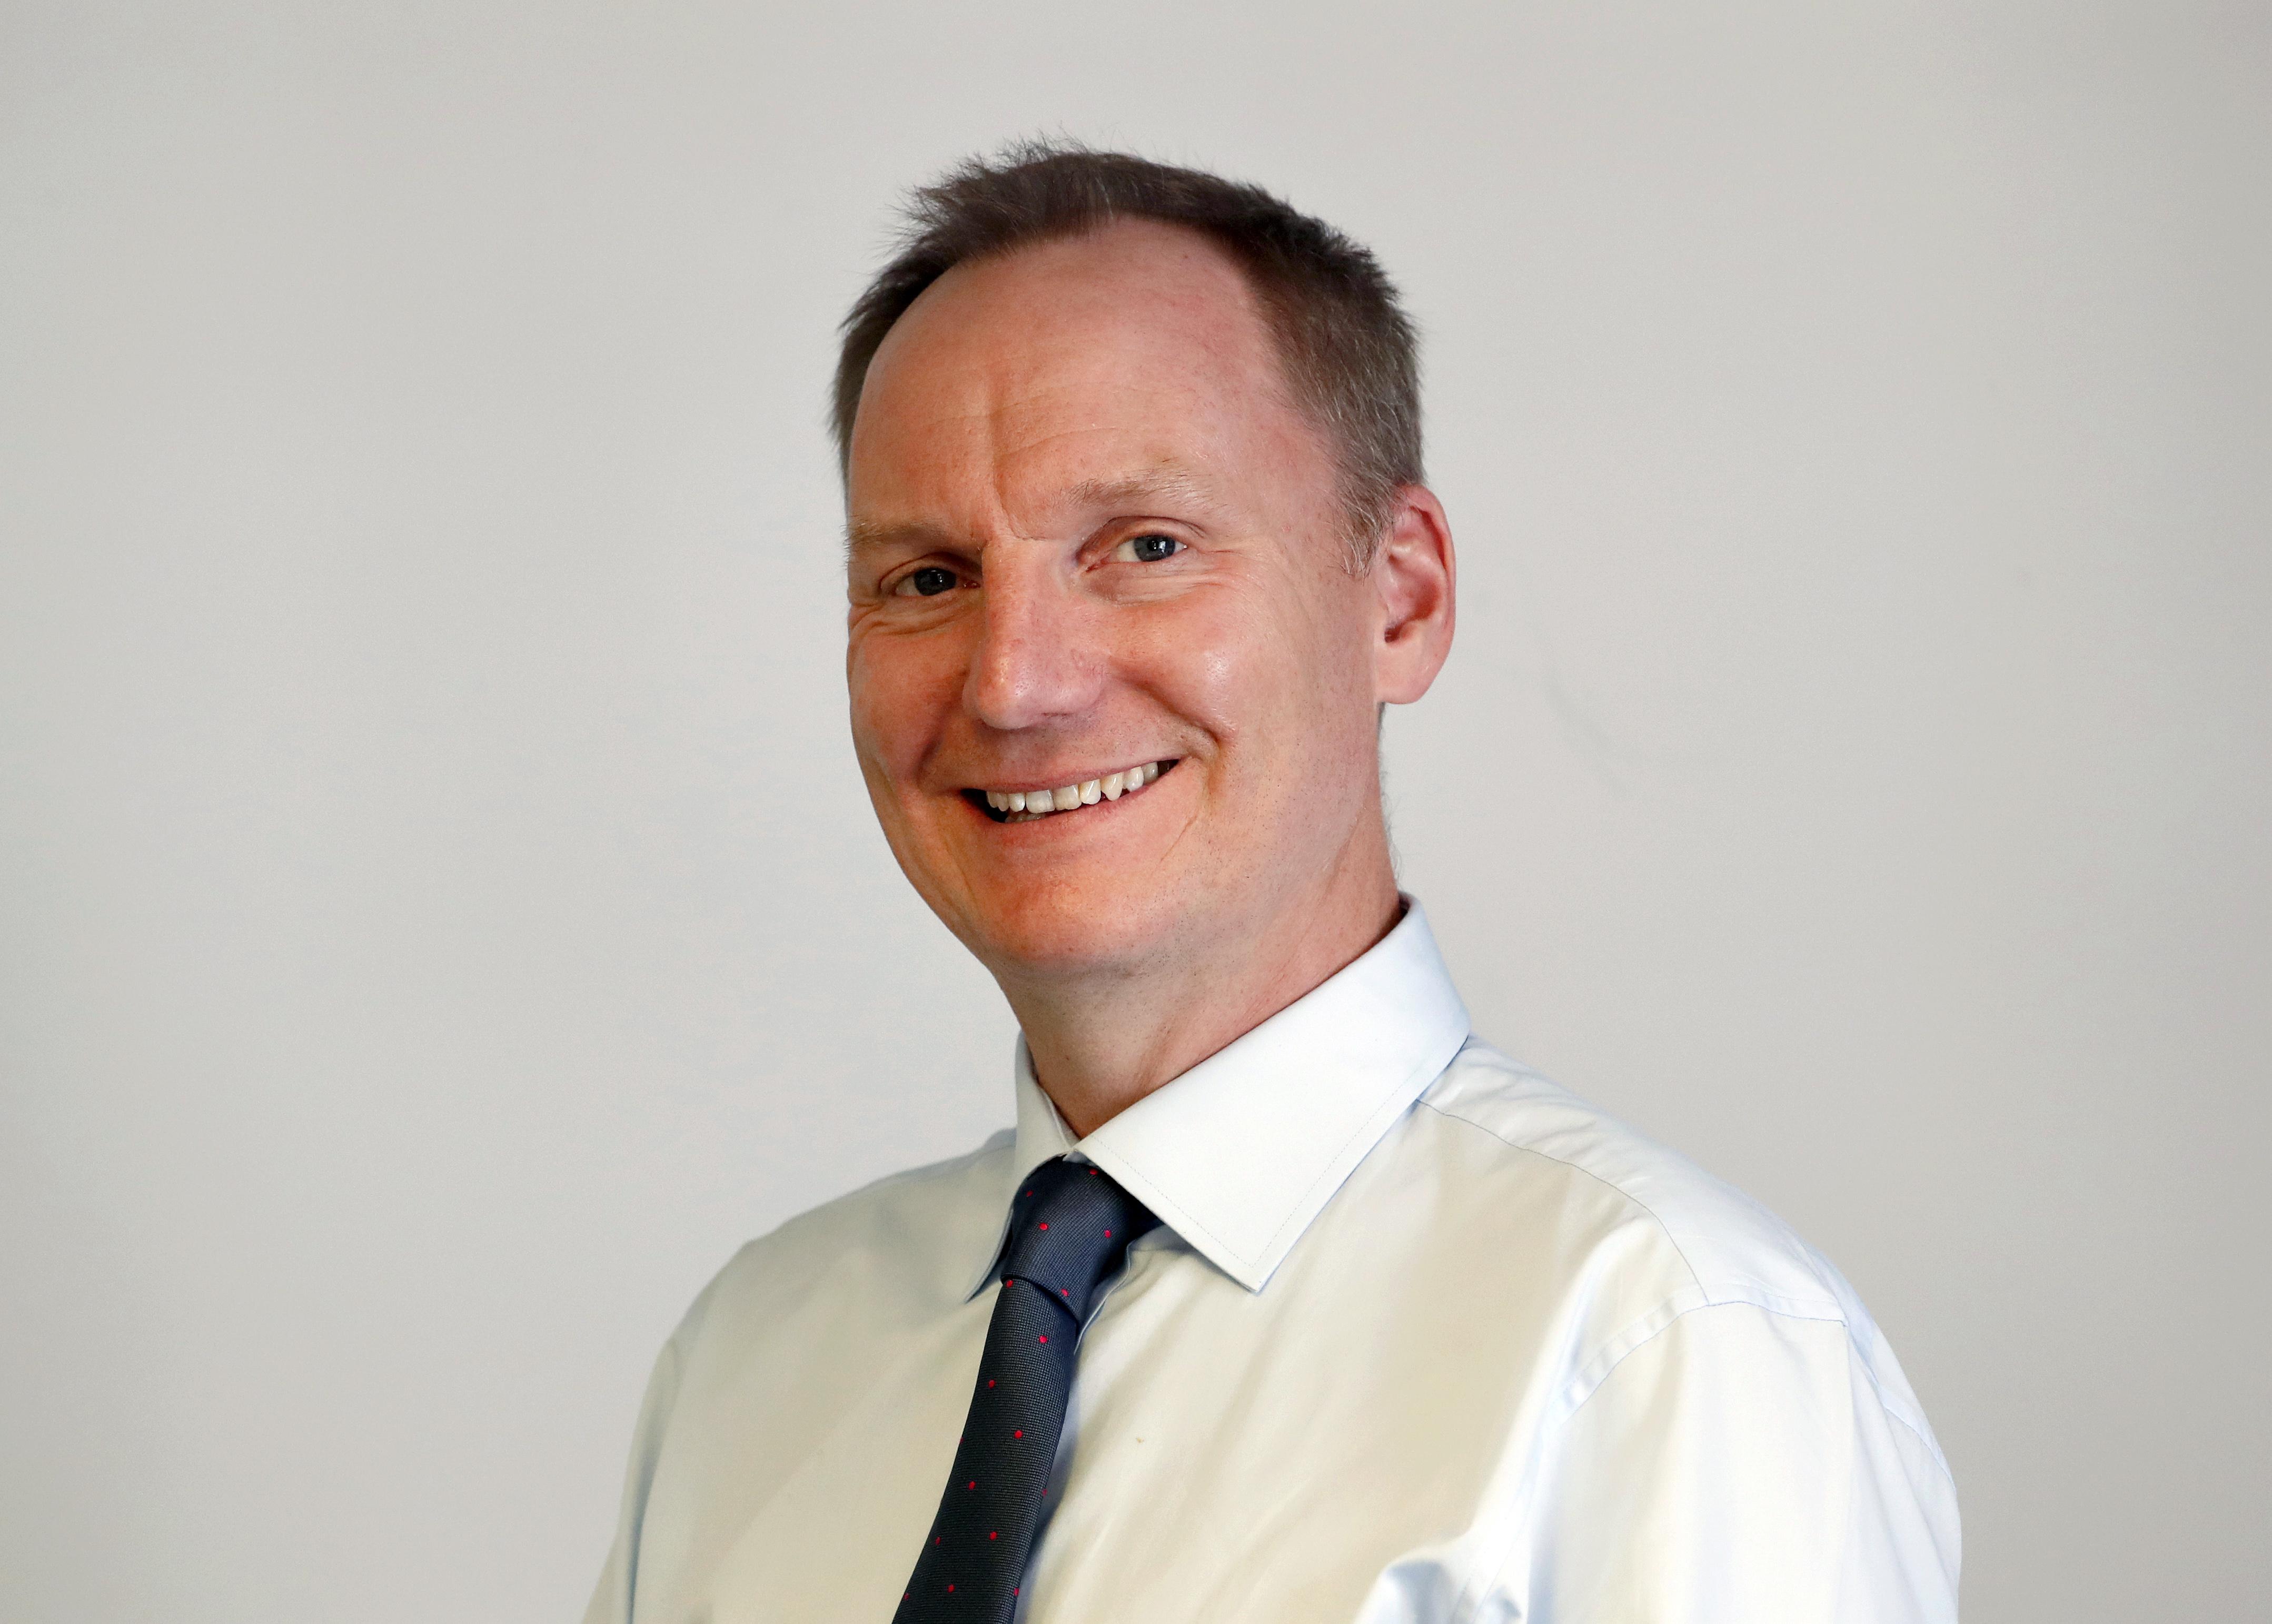 AP names James Jordan as deputy news director for Europe